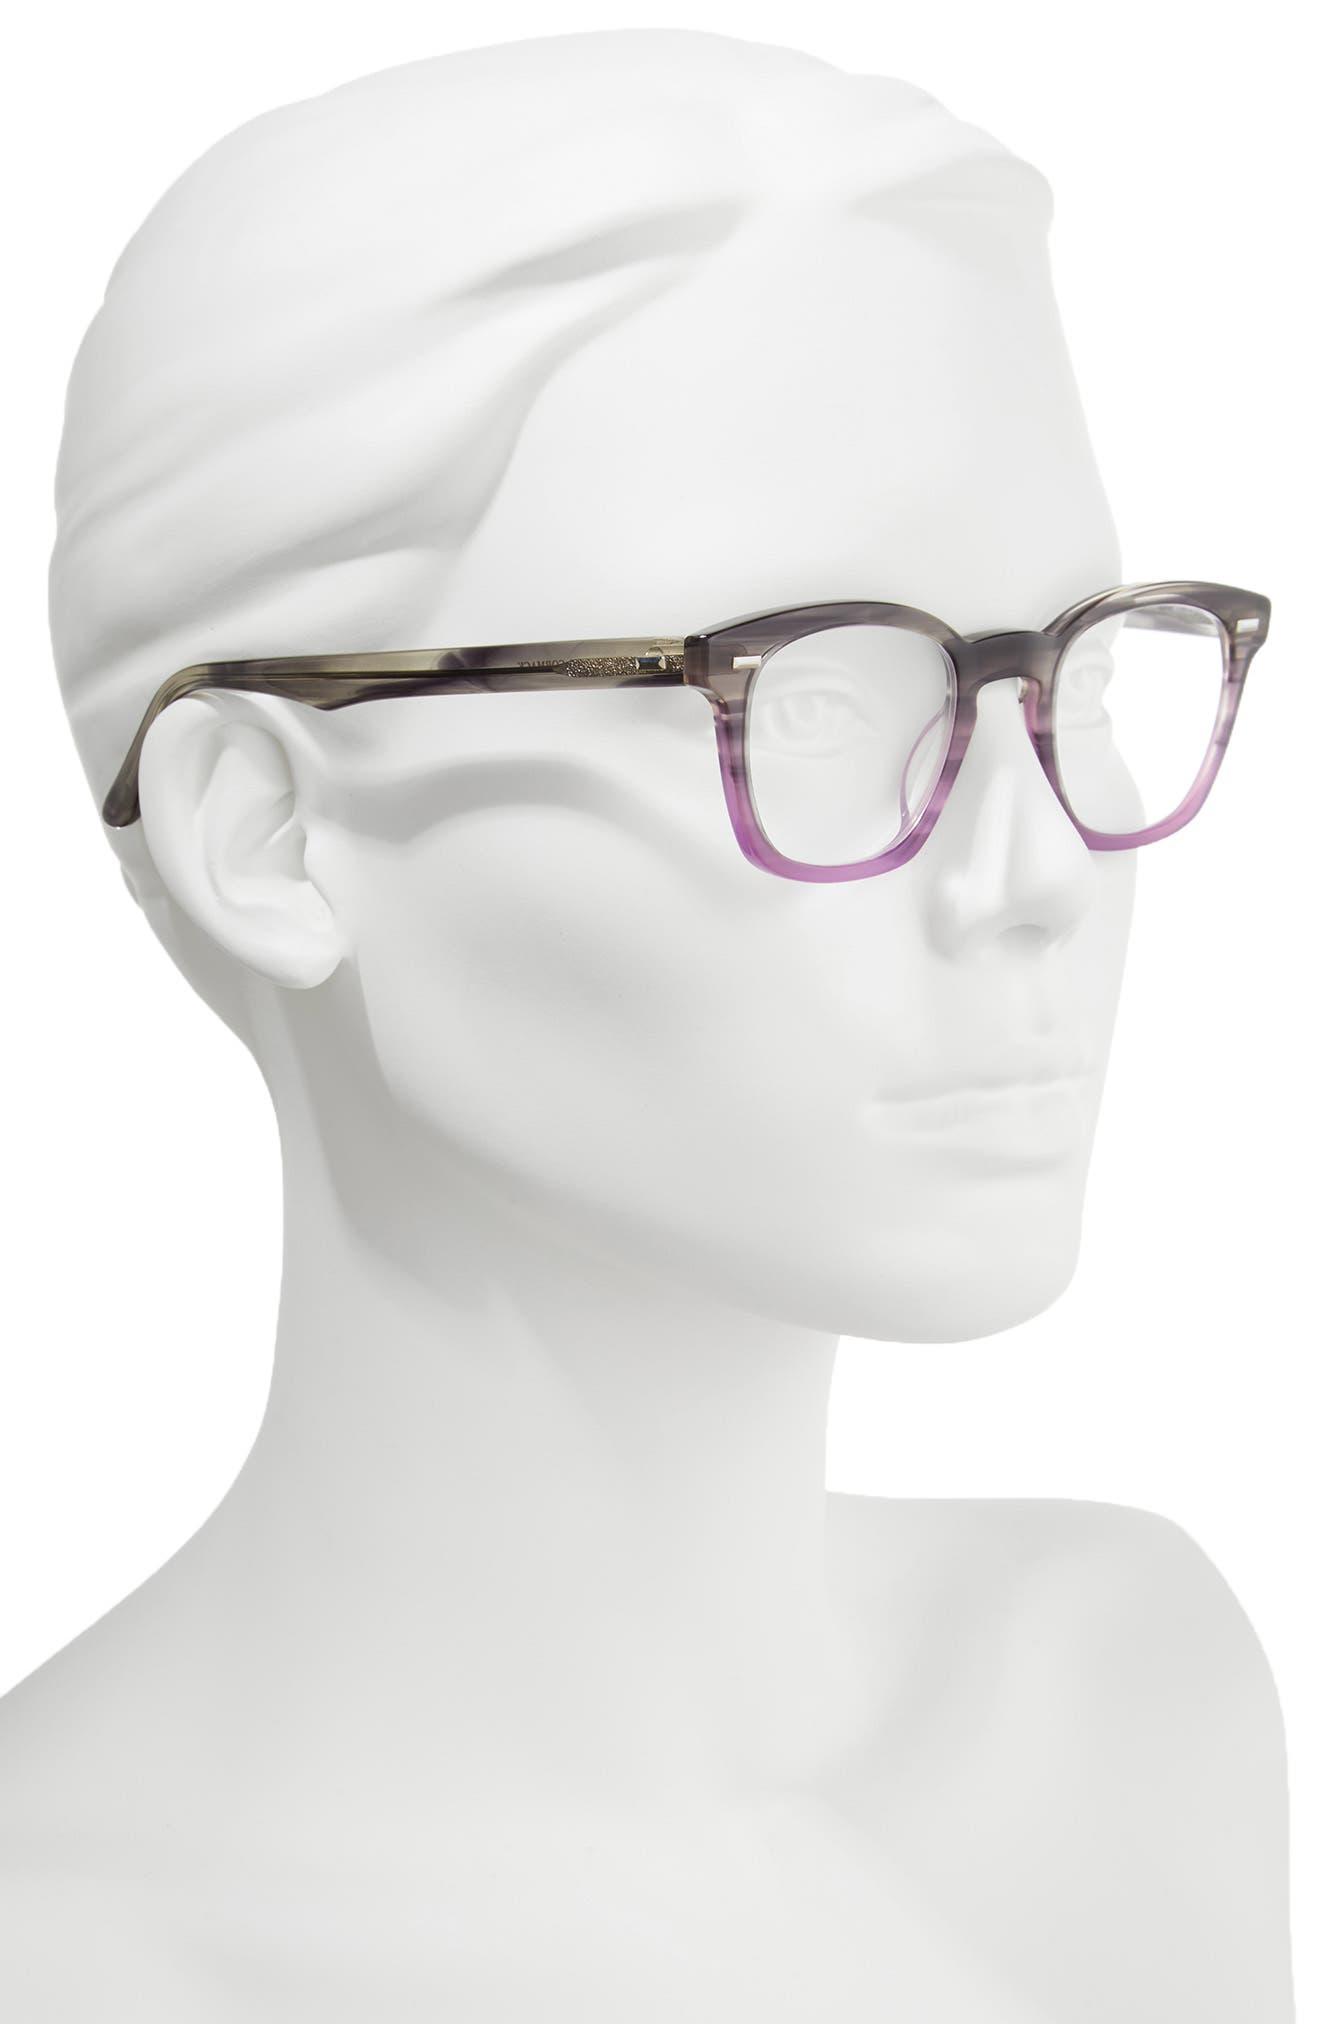 Annie 46mm Reading Glasses,                             Alternate thumbnail 2, color,                             020